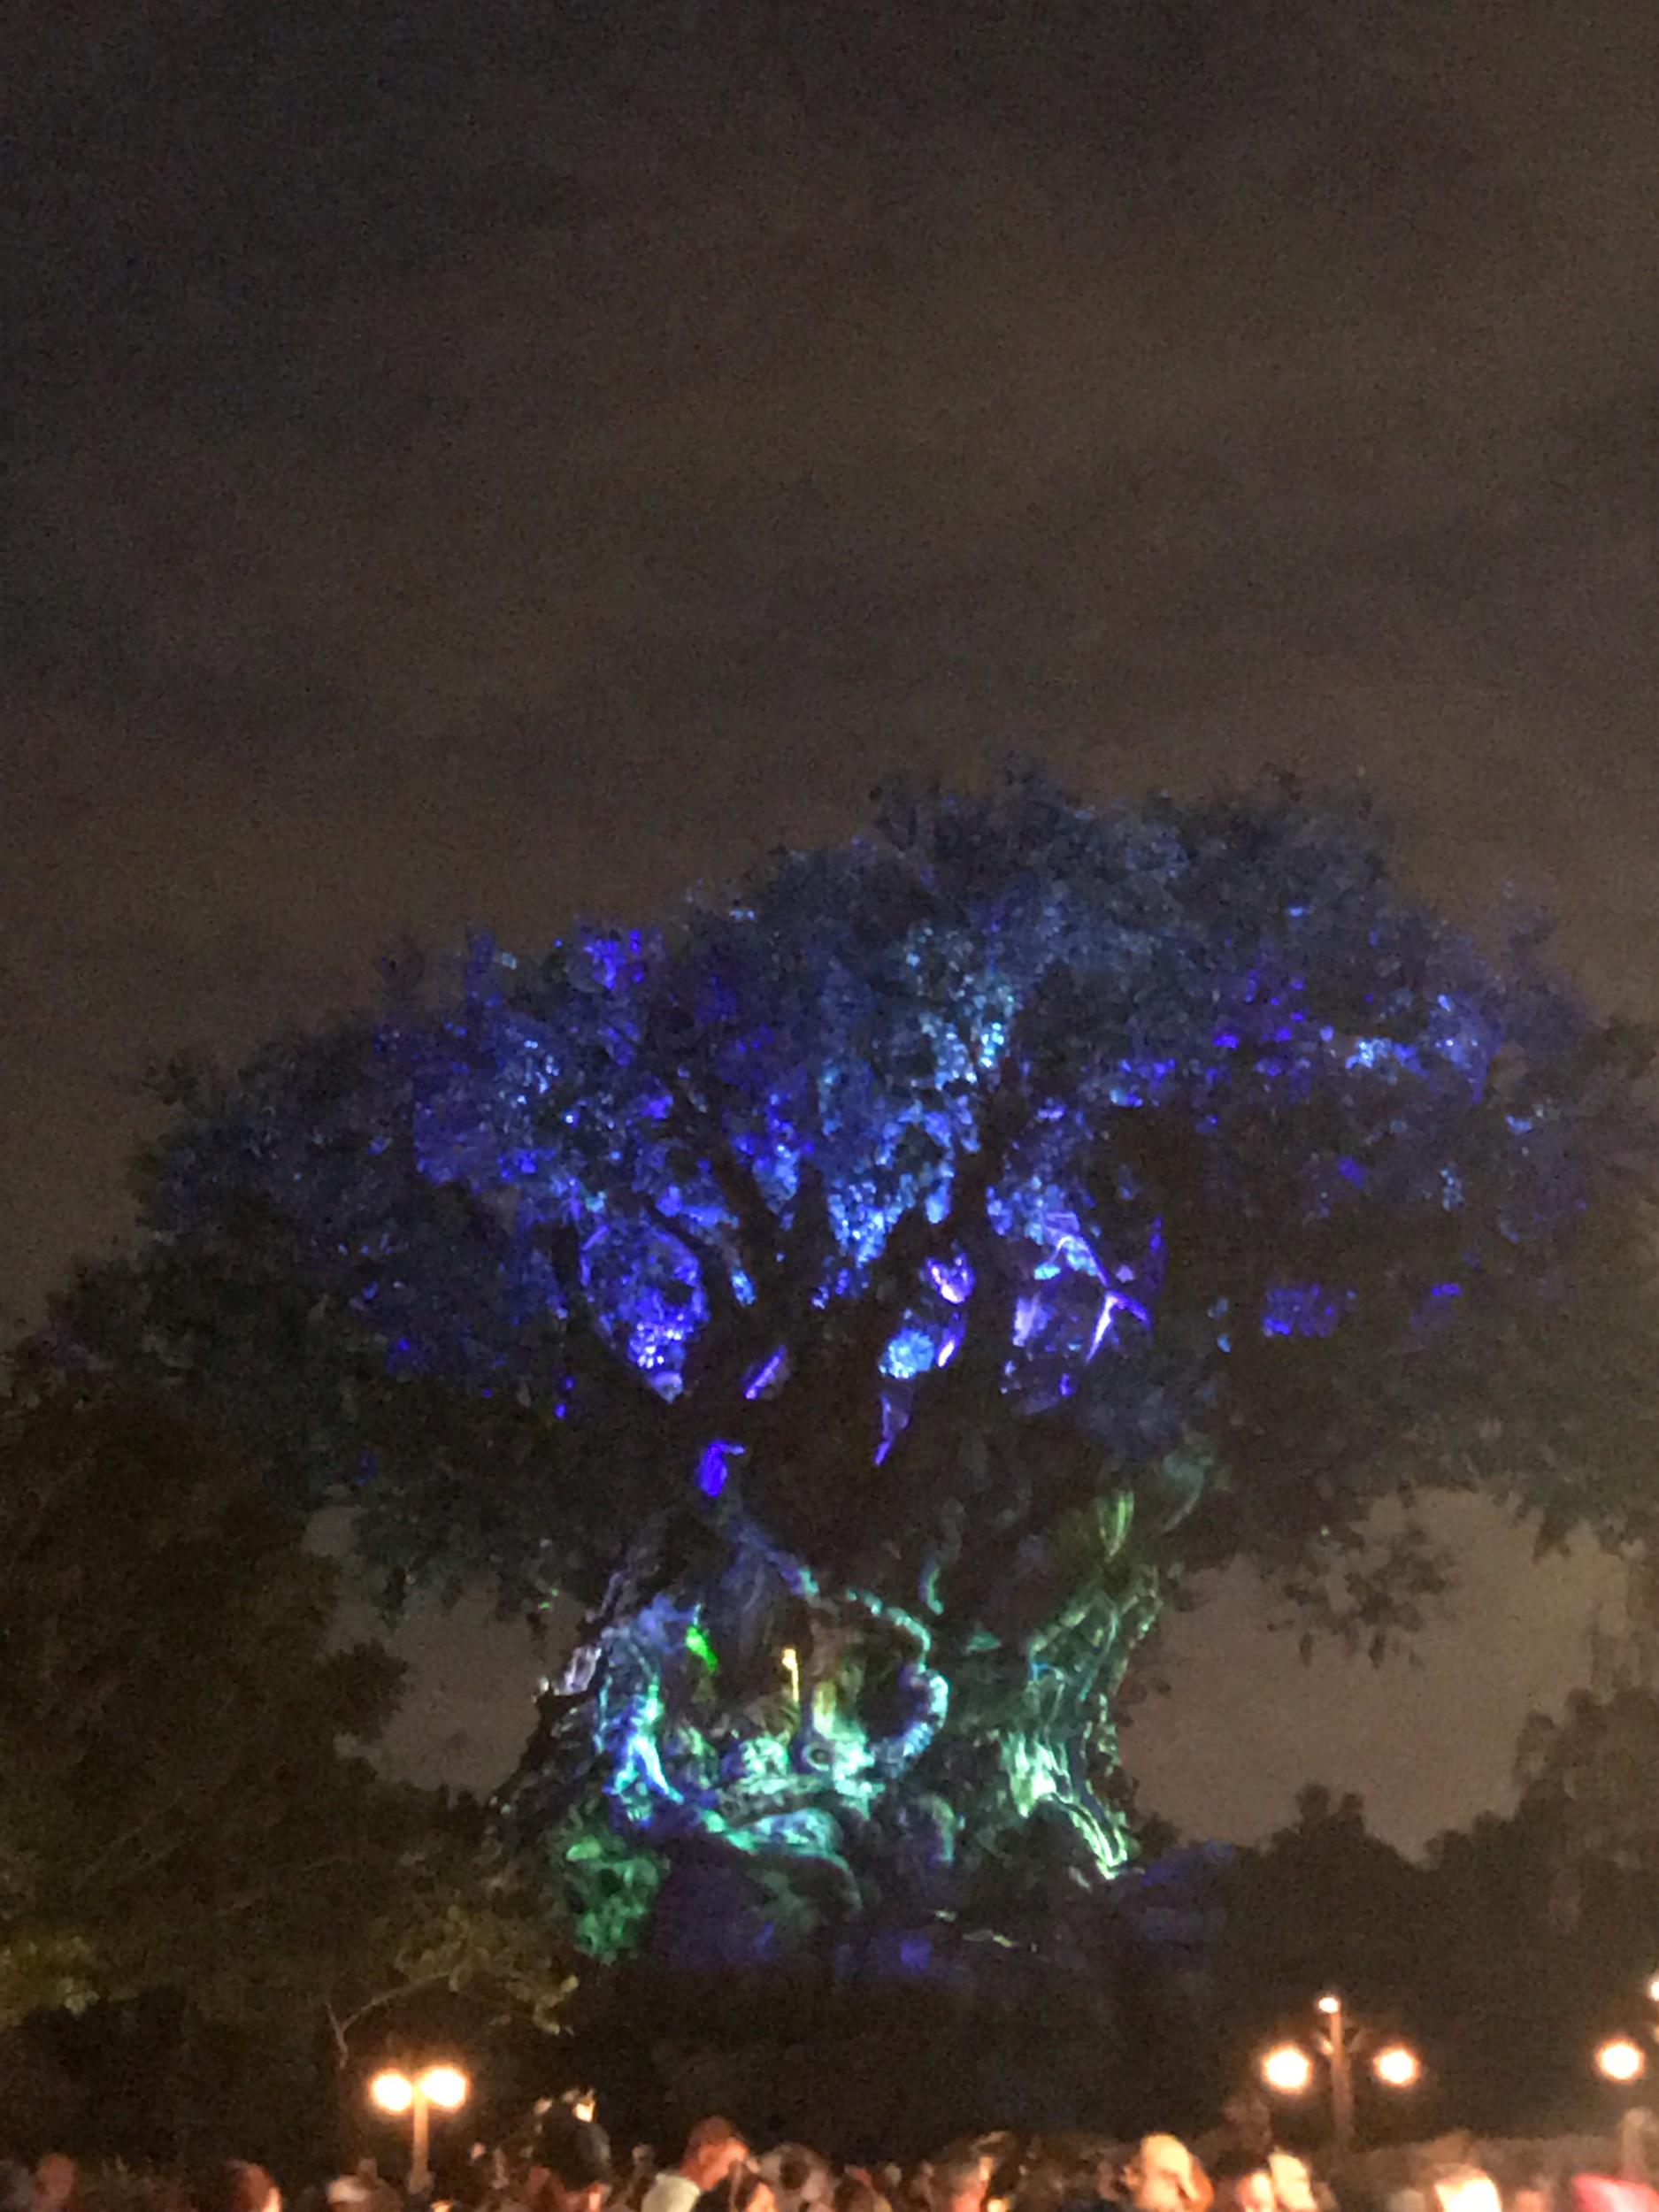 Tree of life at night in Animal Kingdom.